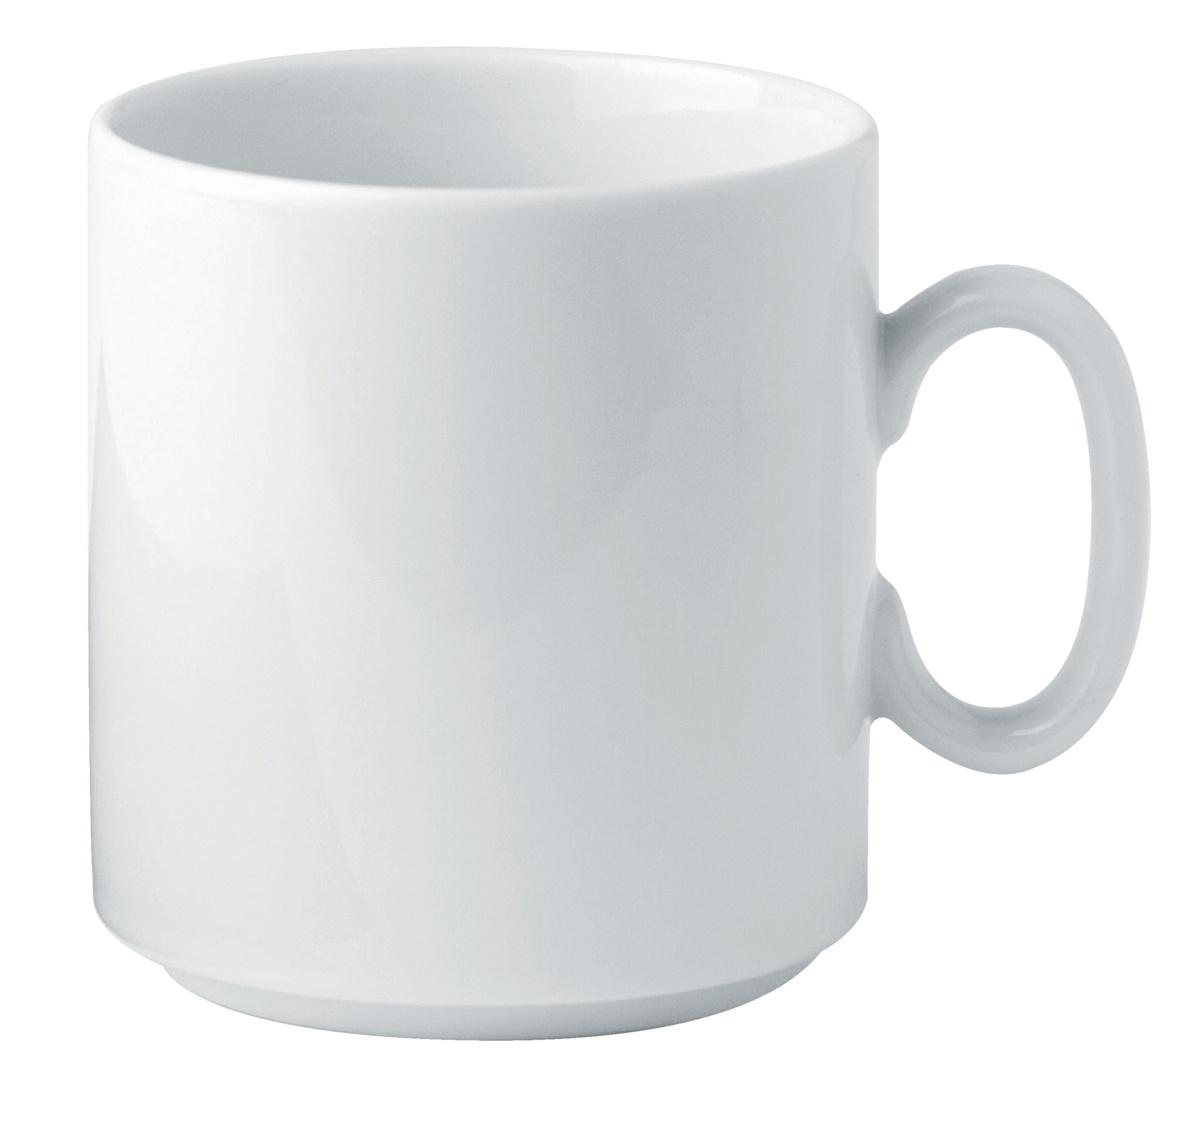 Mug rond blanc porcelaine 30 cl Ø 8 cm K